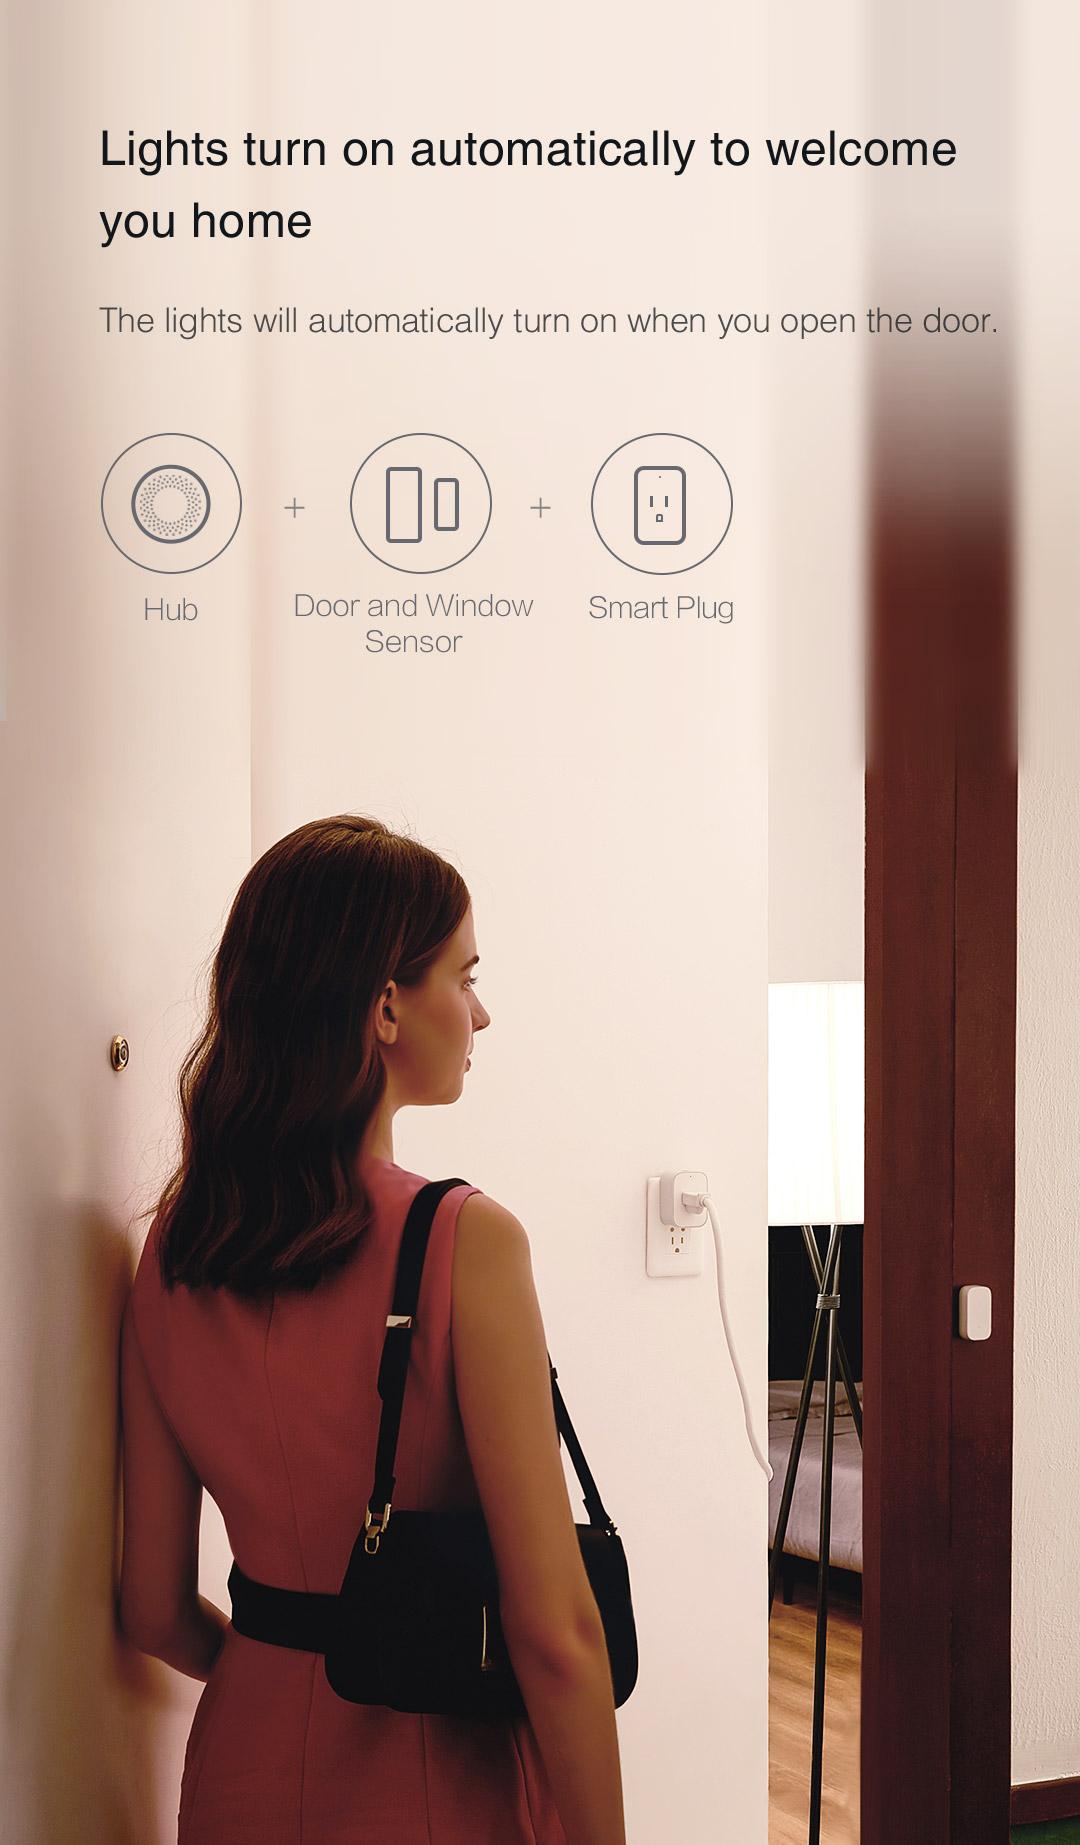 Hub + Smart Plug + Door Sensor: The lights will automatically turn on when you open the door.